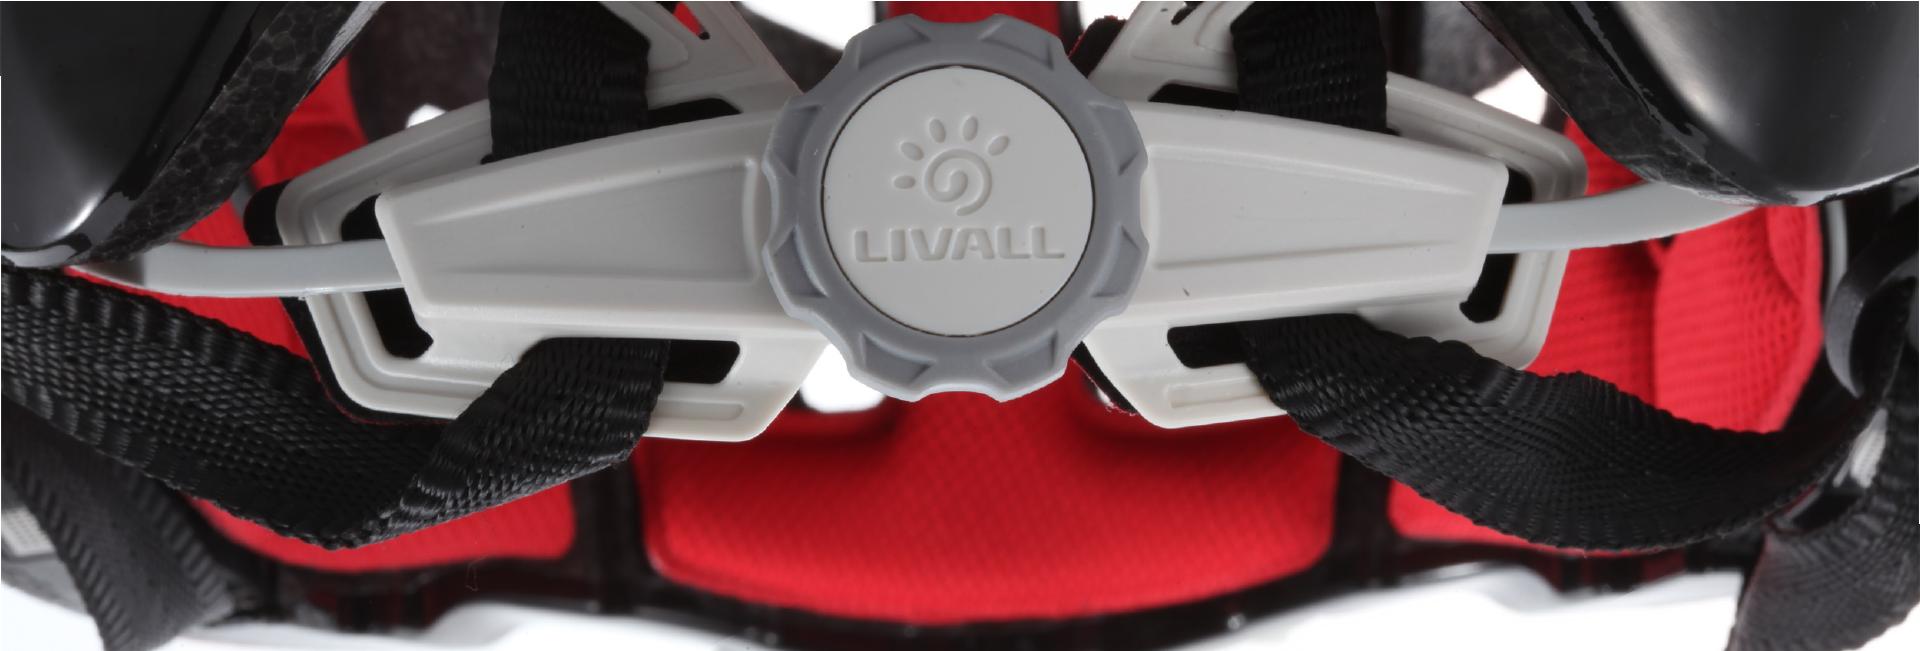 livall-BH60SE